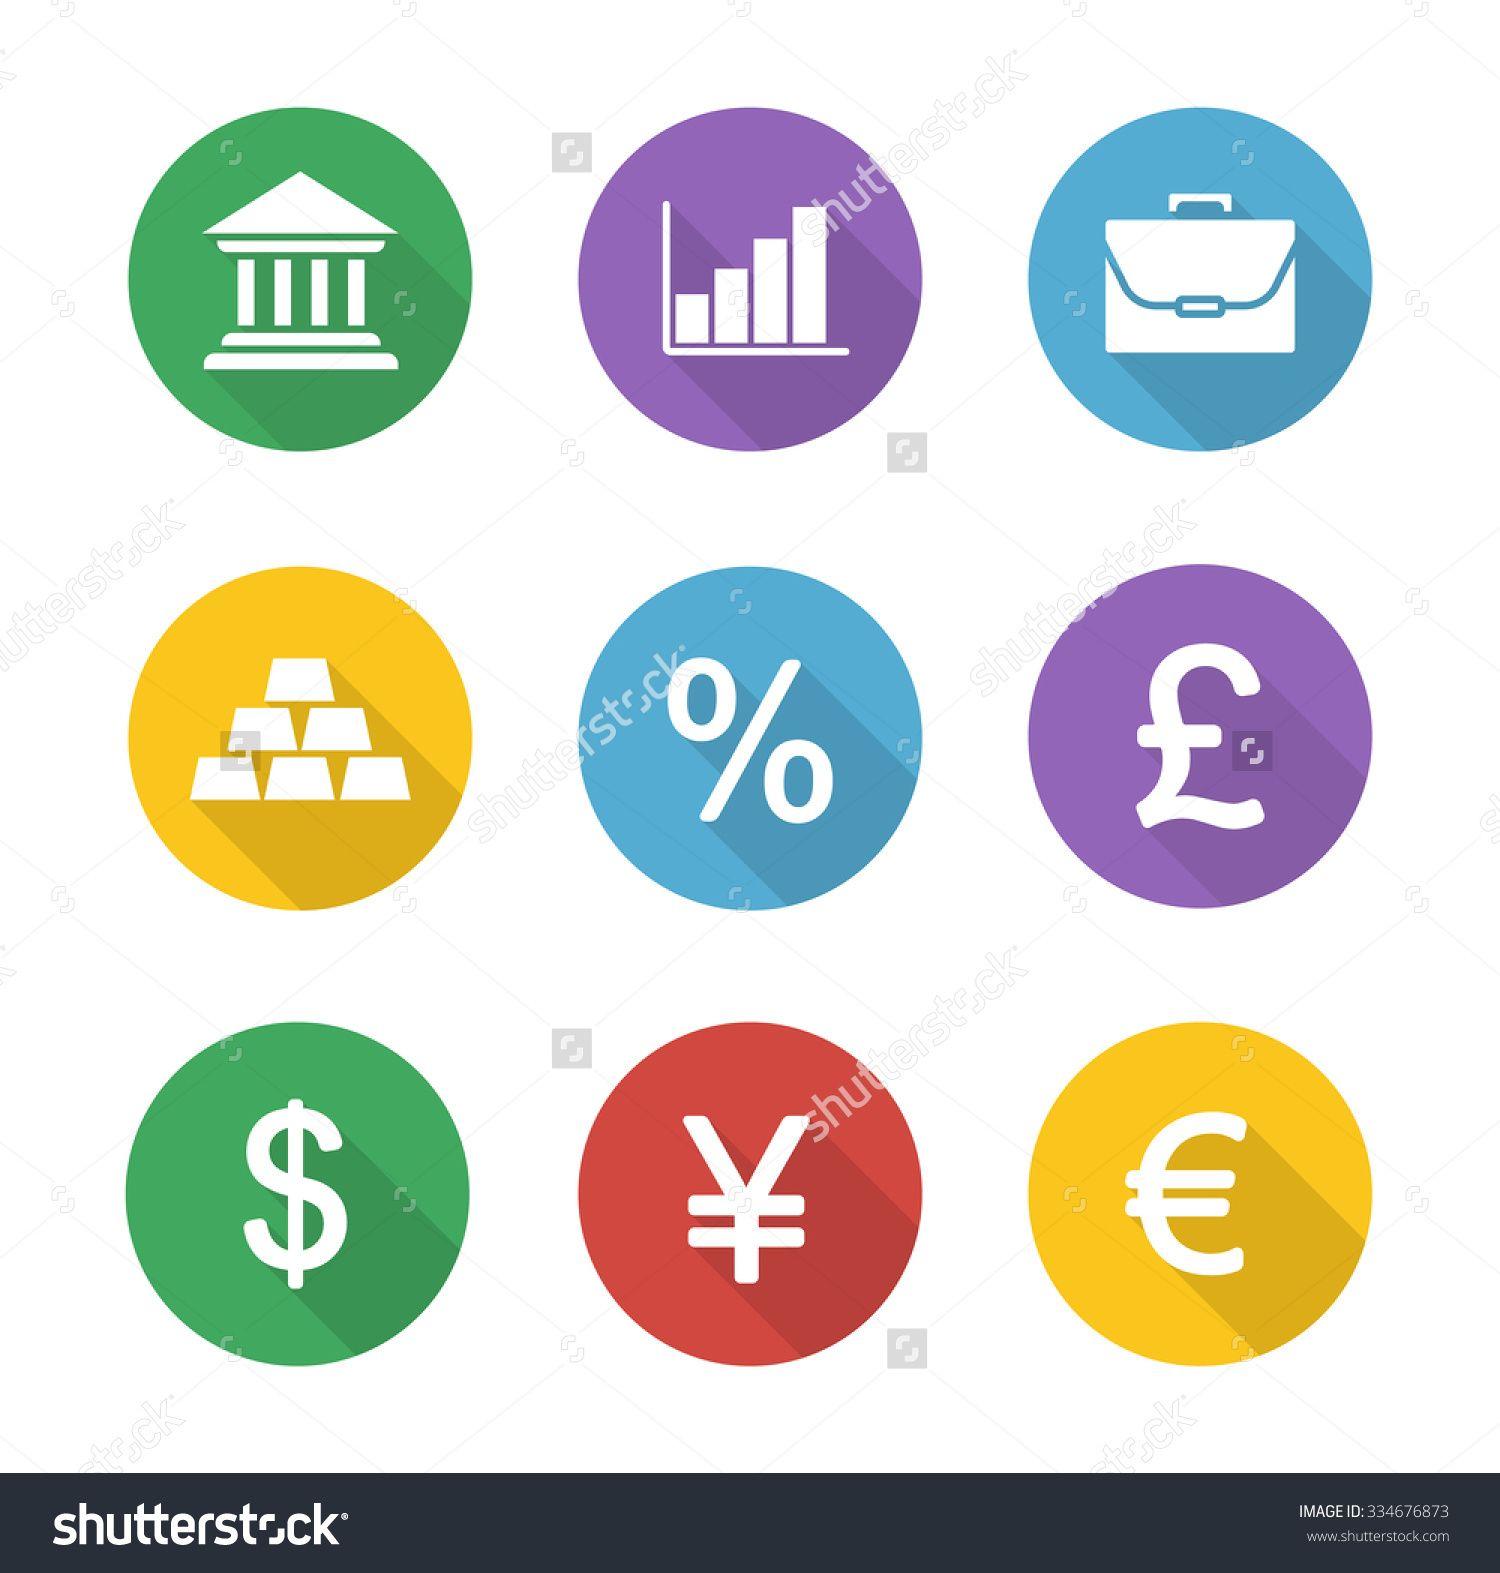 finance flat design Google Search Flat design icons